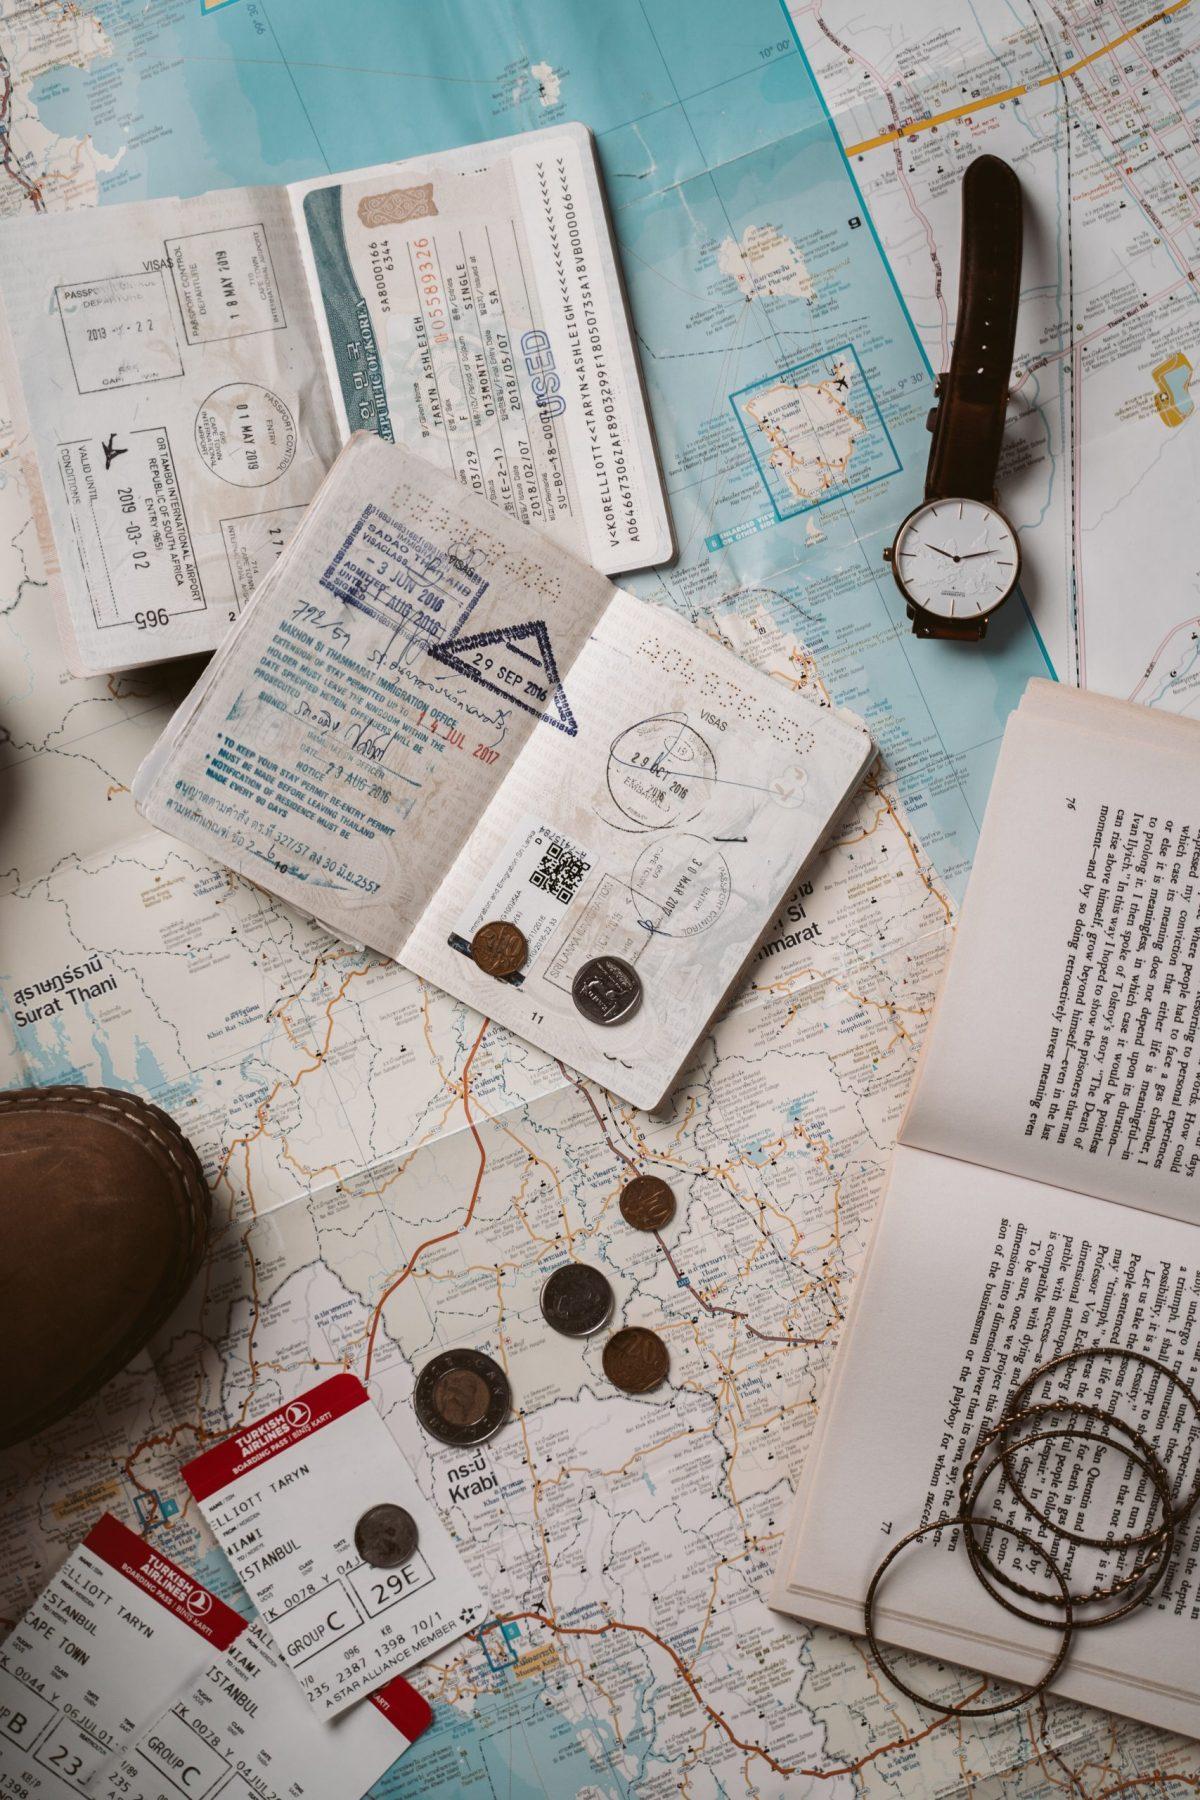 Travel (302471)